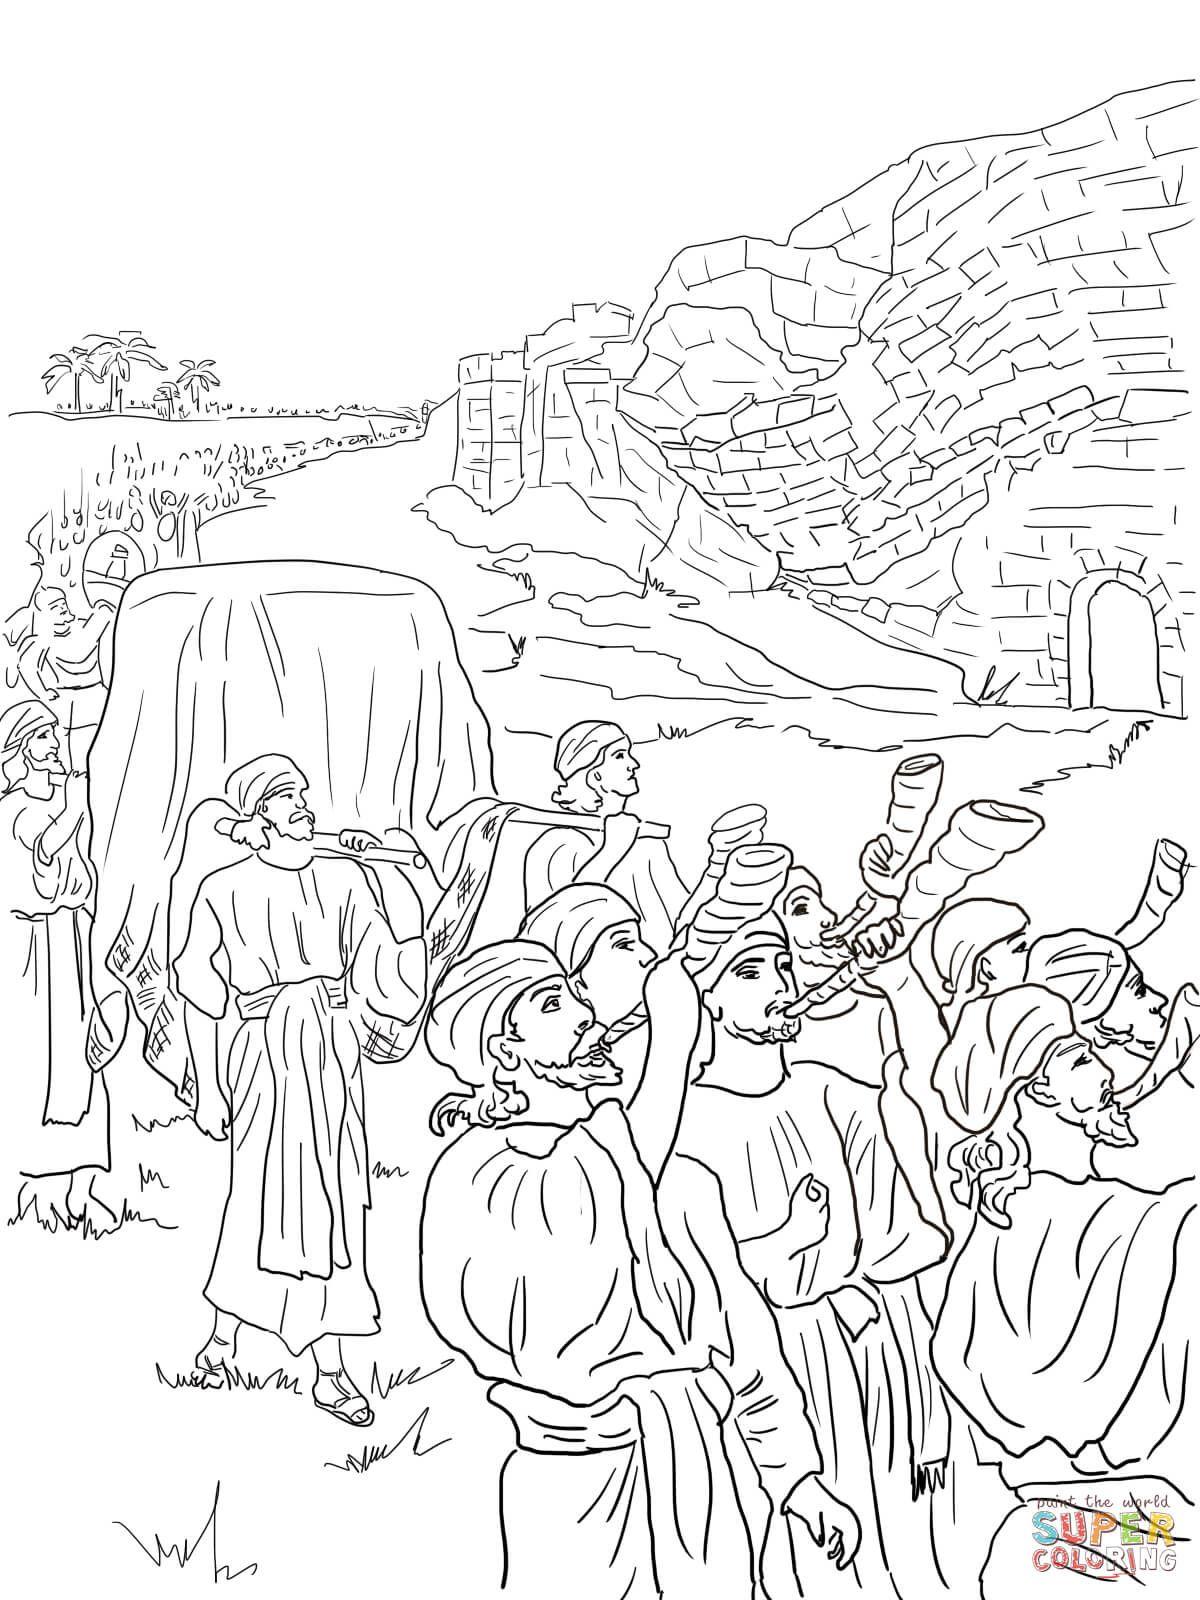 Walls Of Jericho Colo Google S. Coloring Page Of Joshua